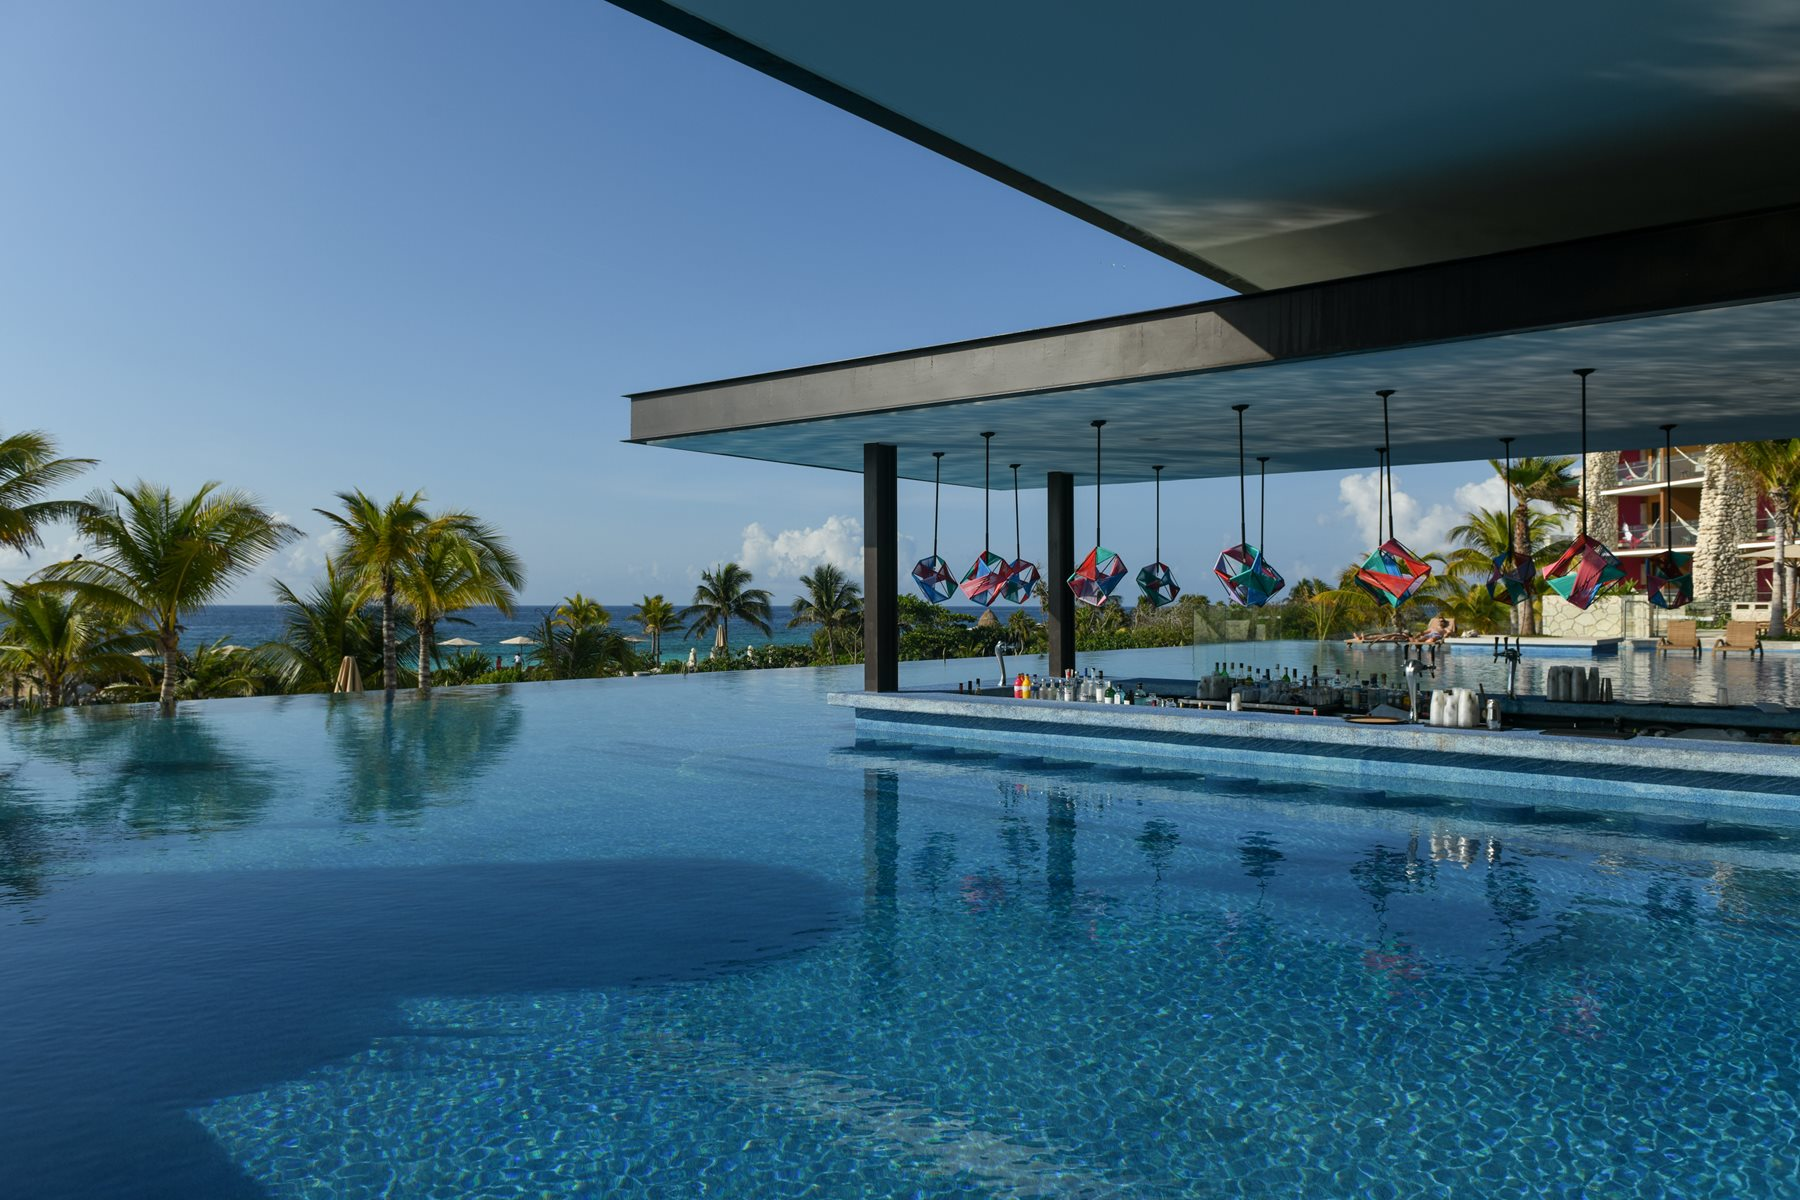 RIV-Hotel-Xcaret-Trajinera-Swimup-Bar-001